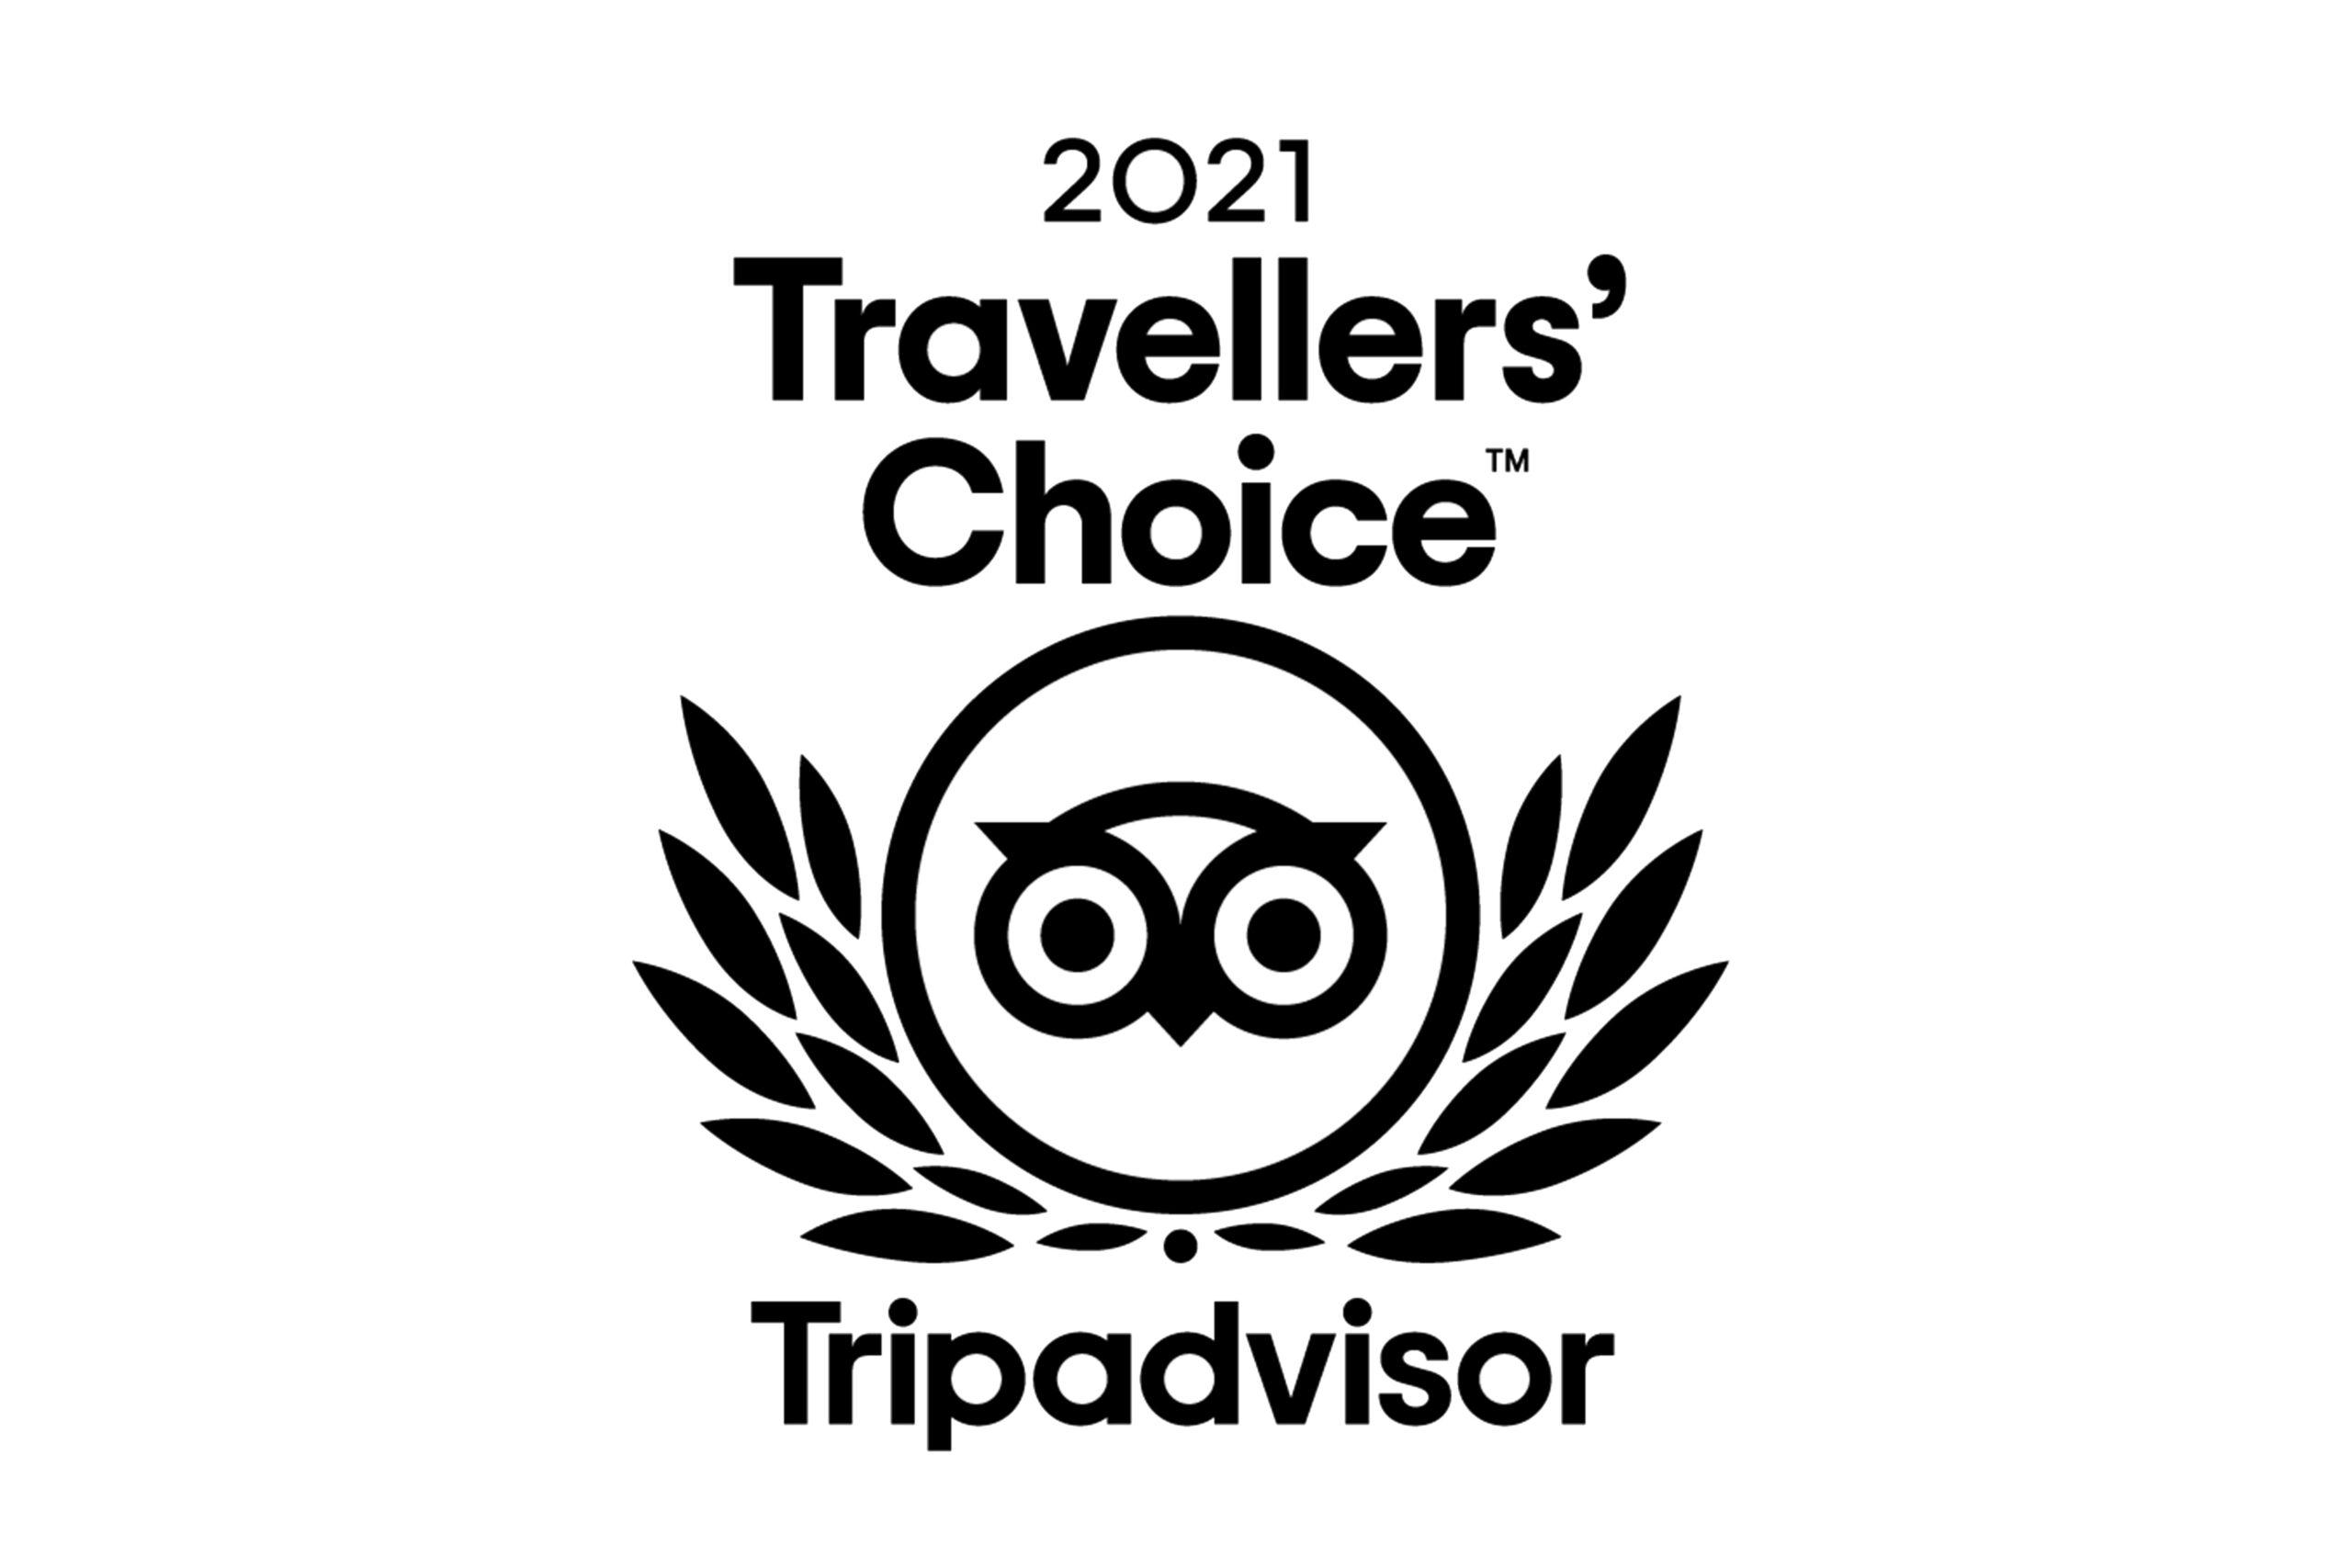 Tops on Tripadvisor